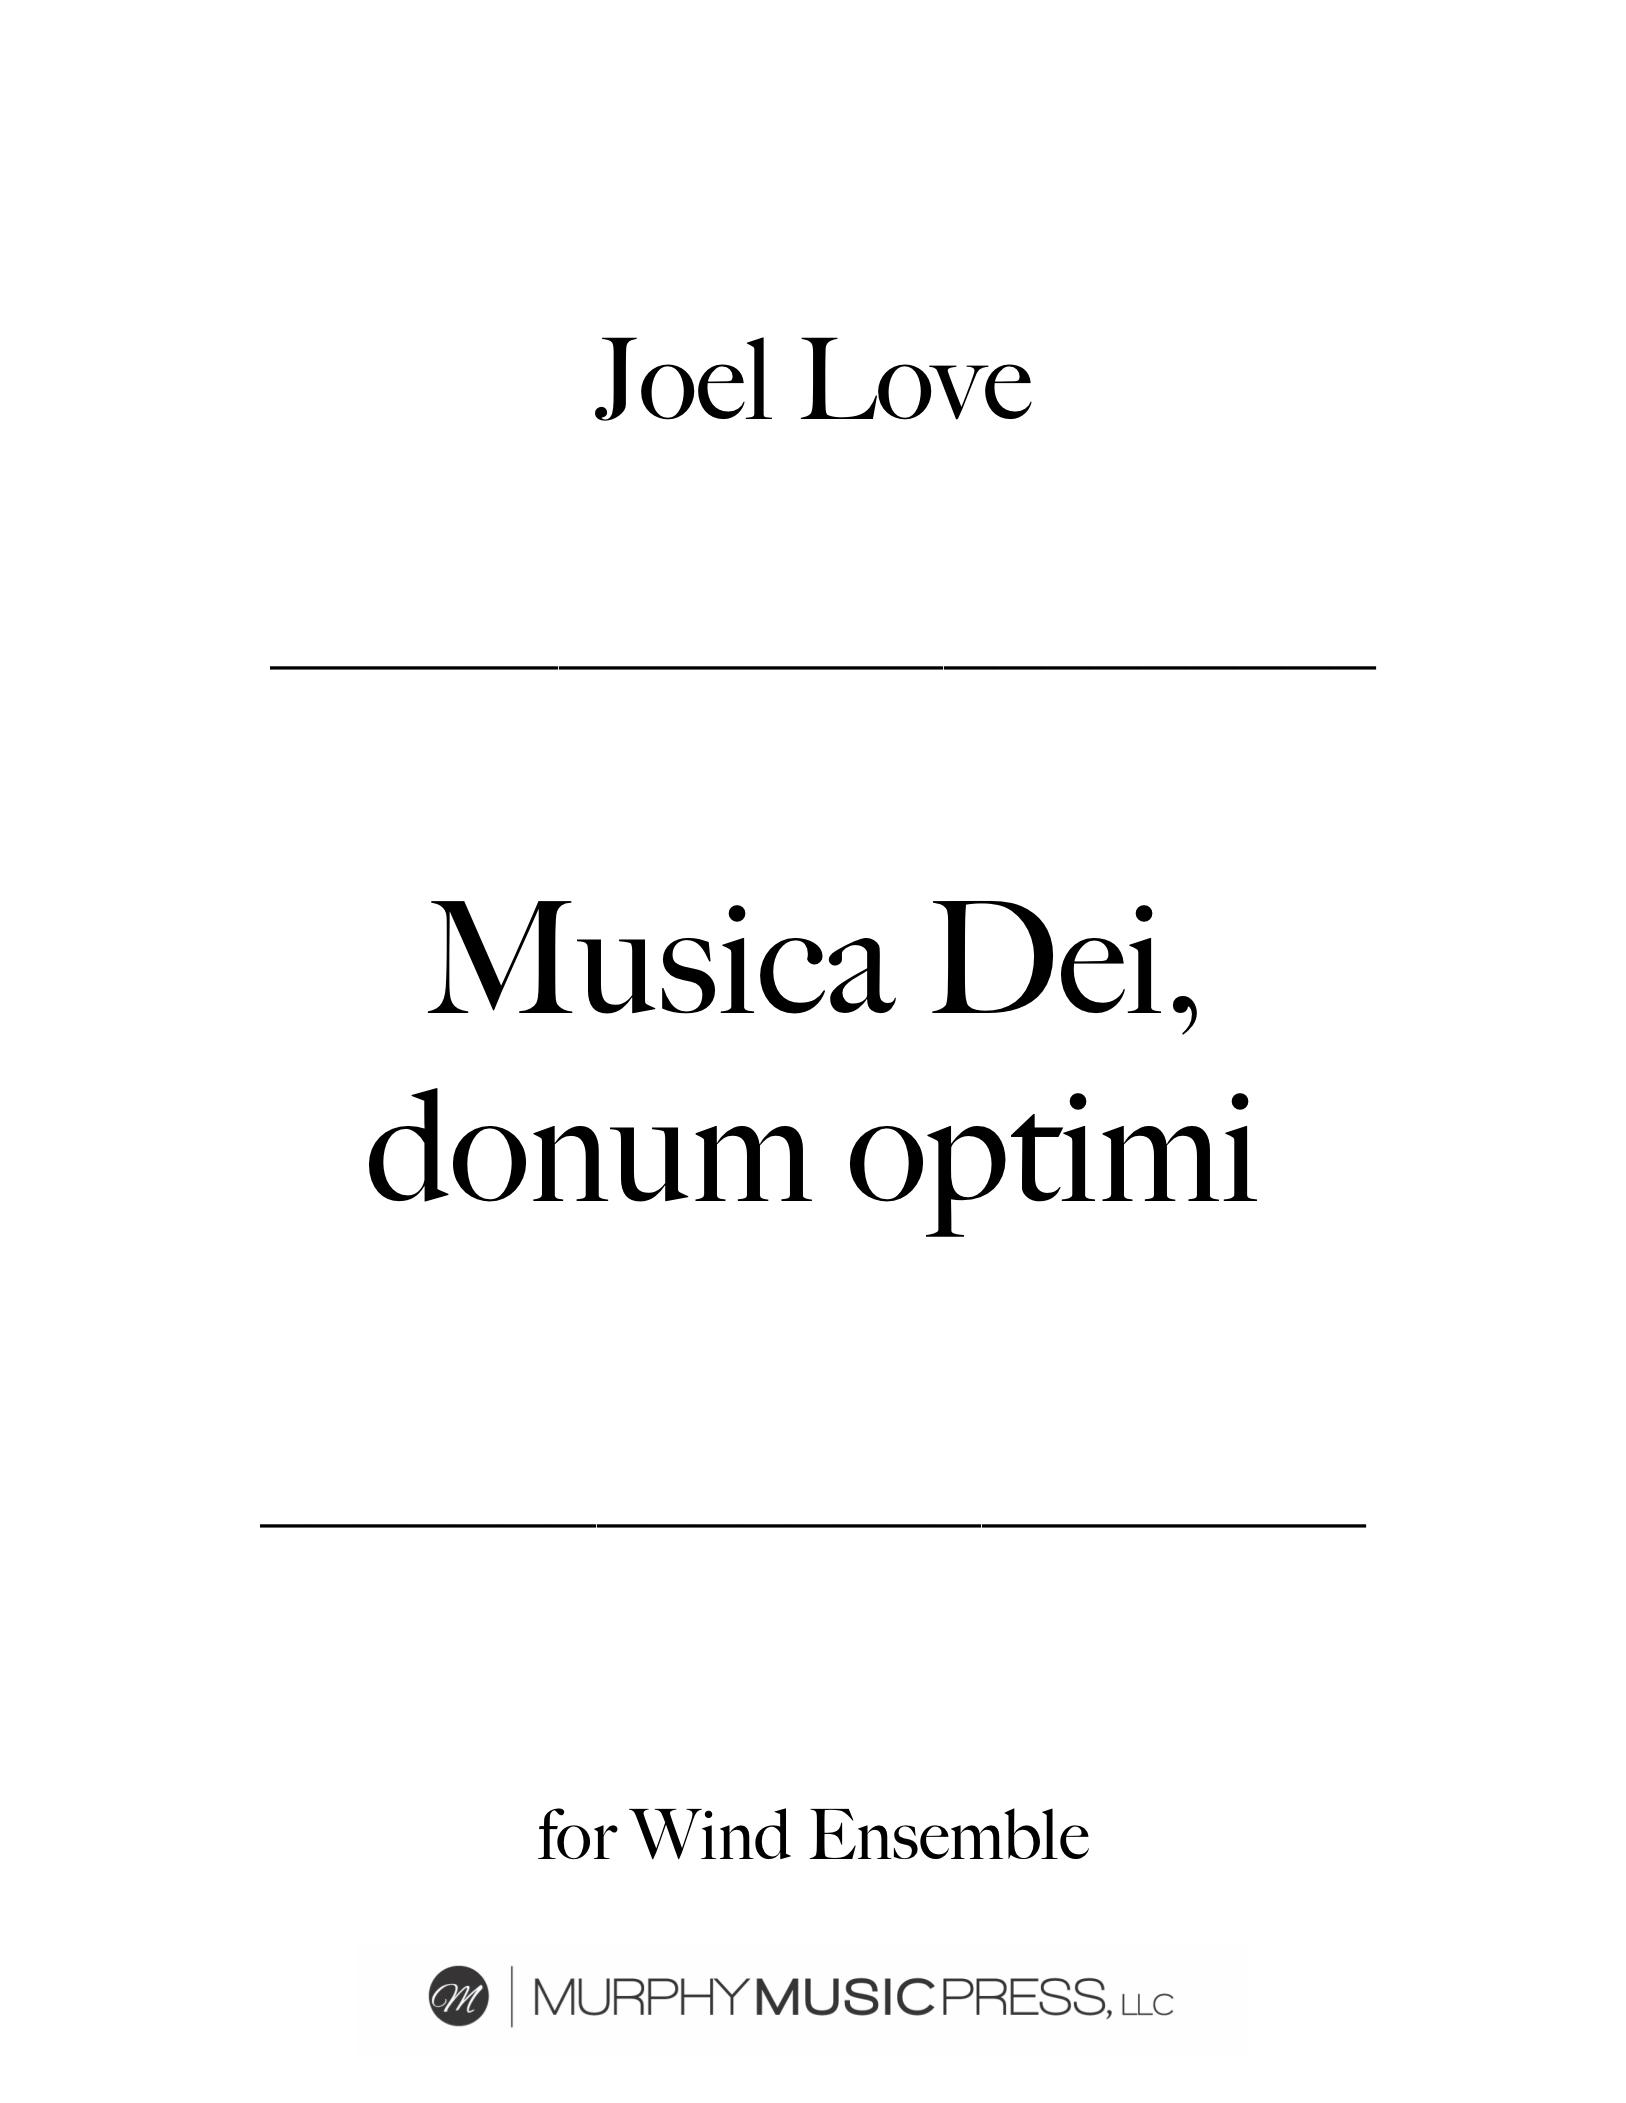 Musica Dei, Donum Optimi  by Joel Love